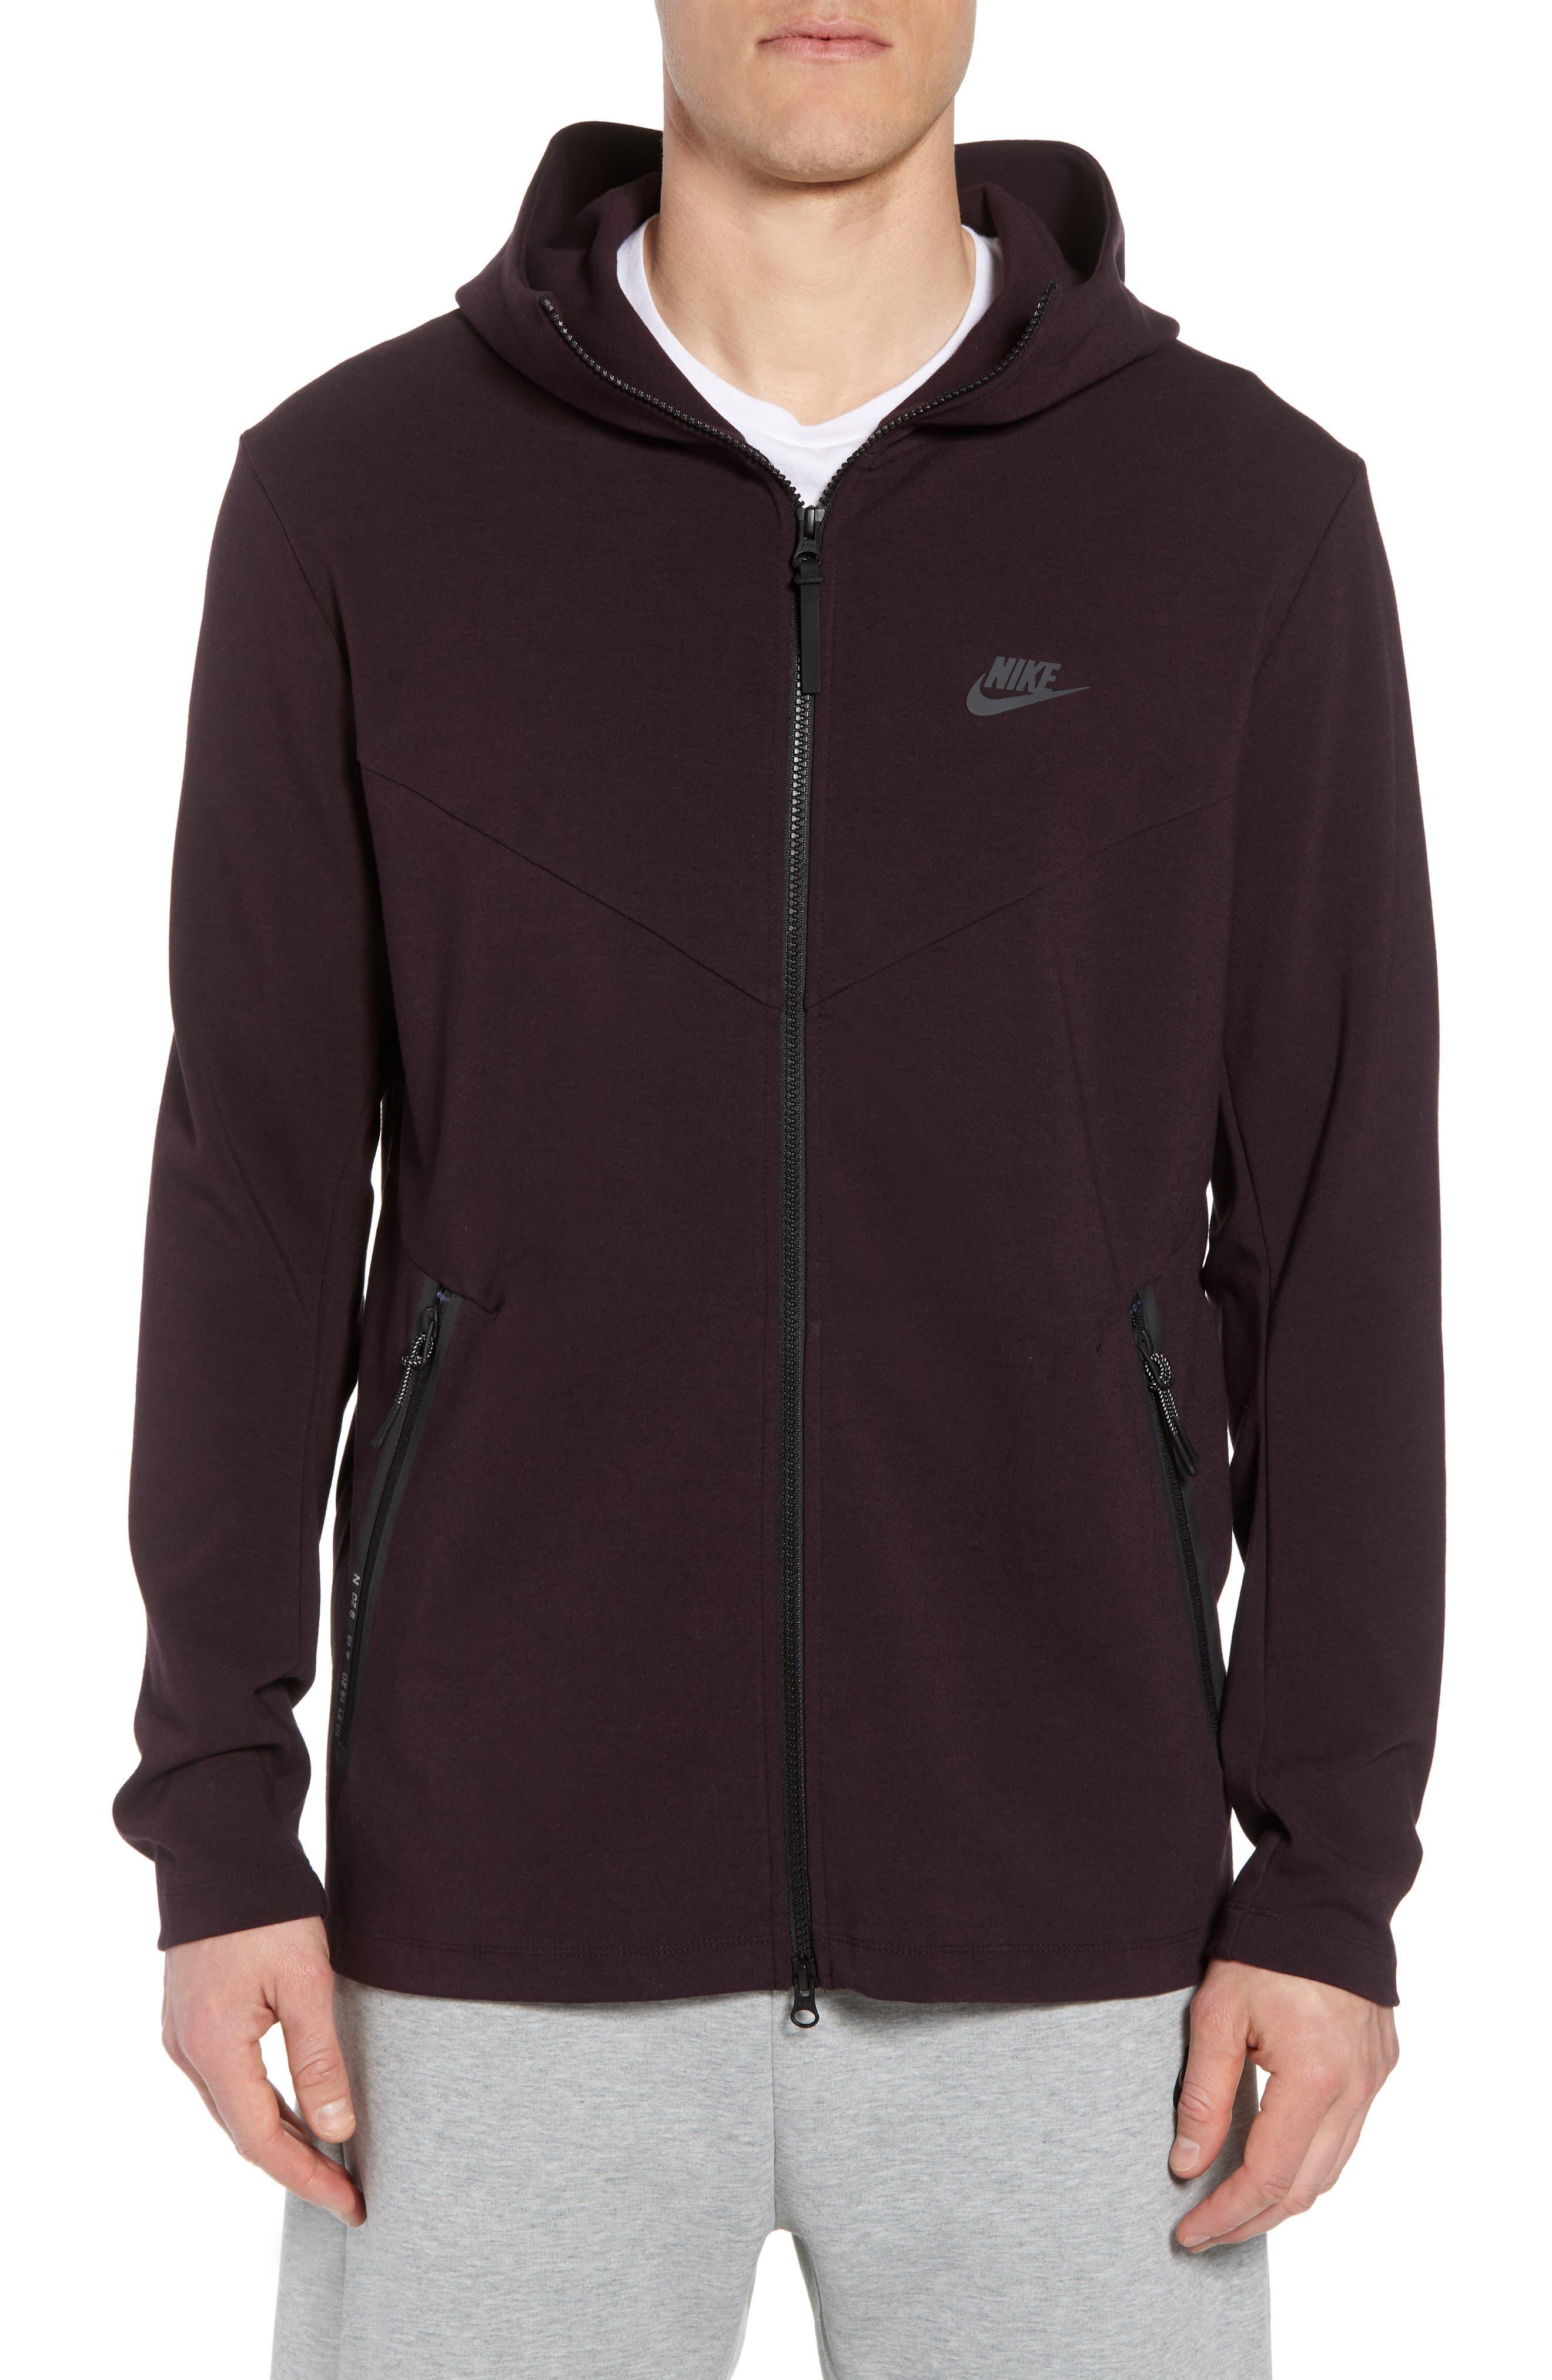 NIKE Sportswear Tech Full Zip Hoodie, Main, color, 010